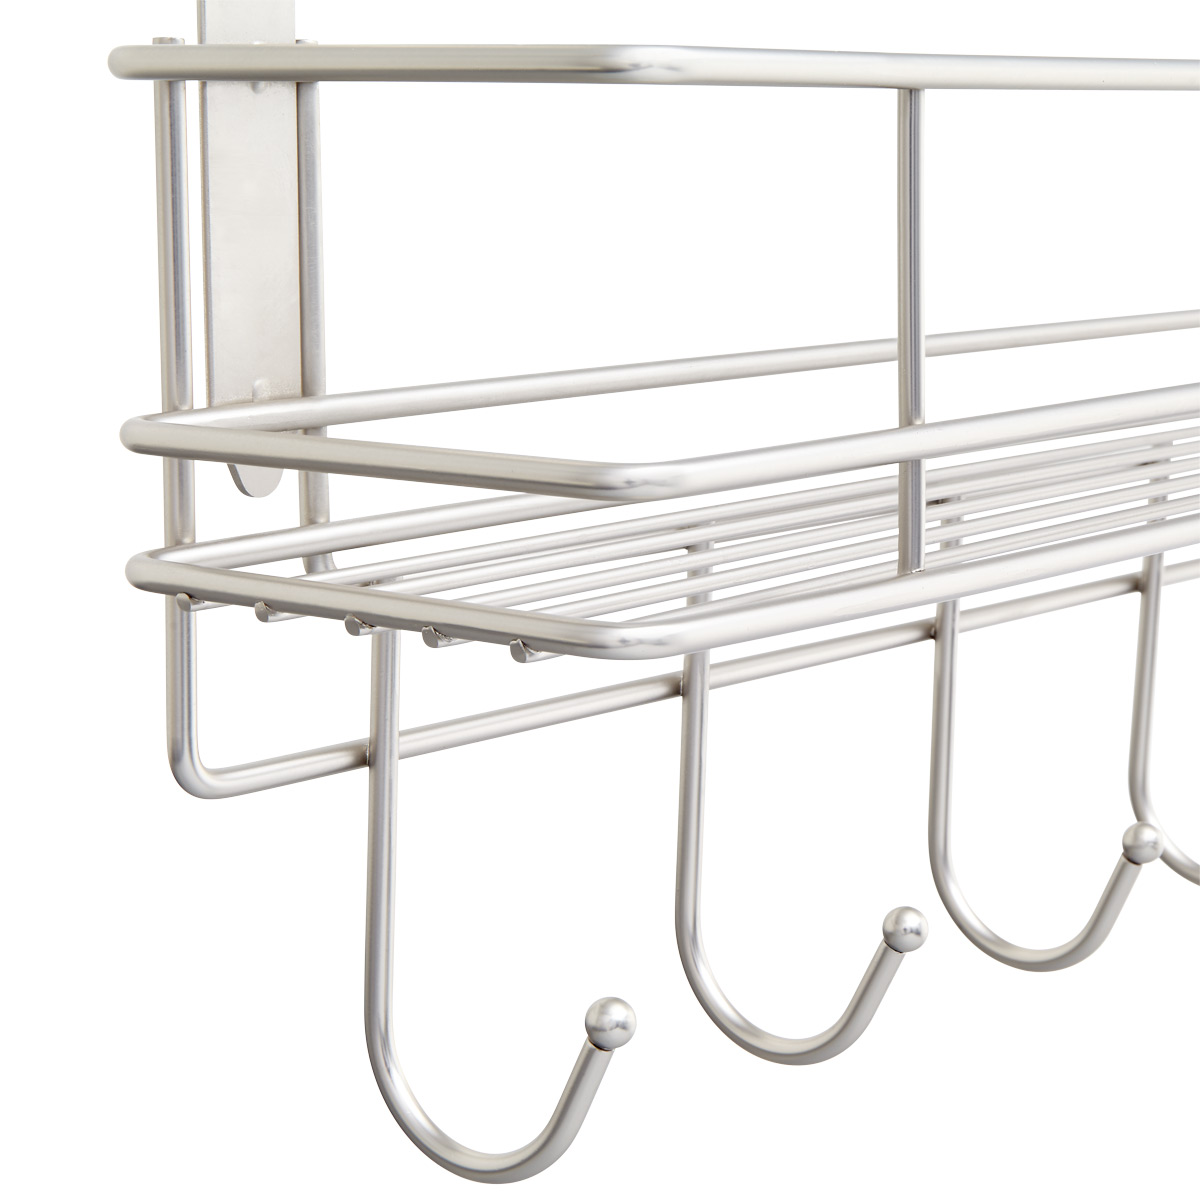 OTD 5 Hook Rack with Basket